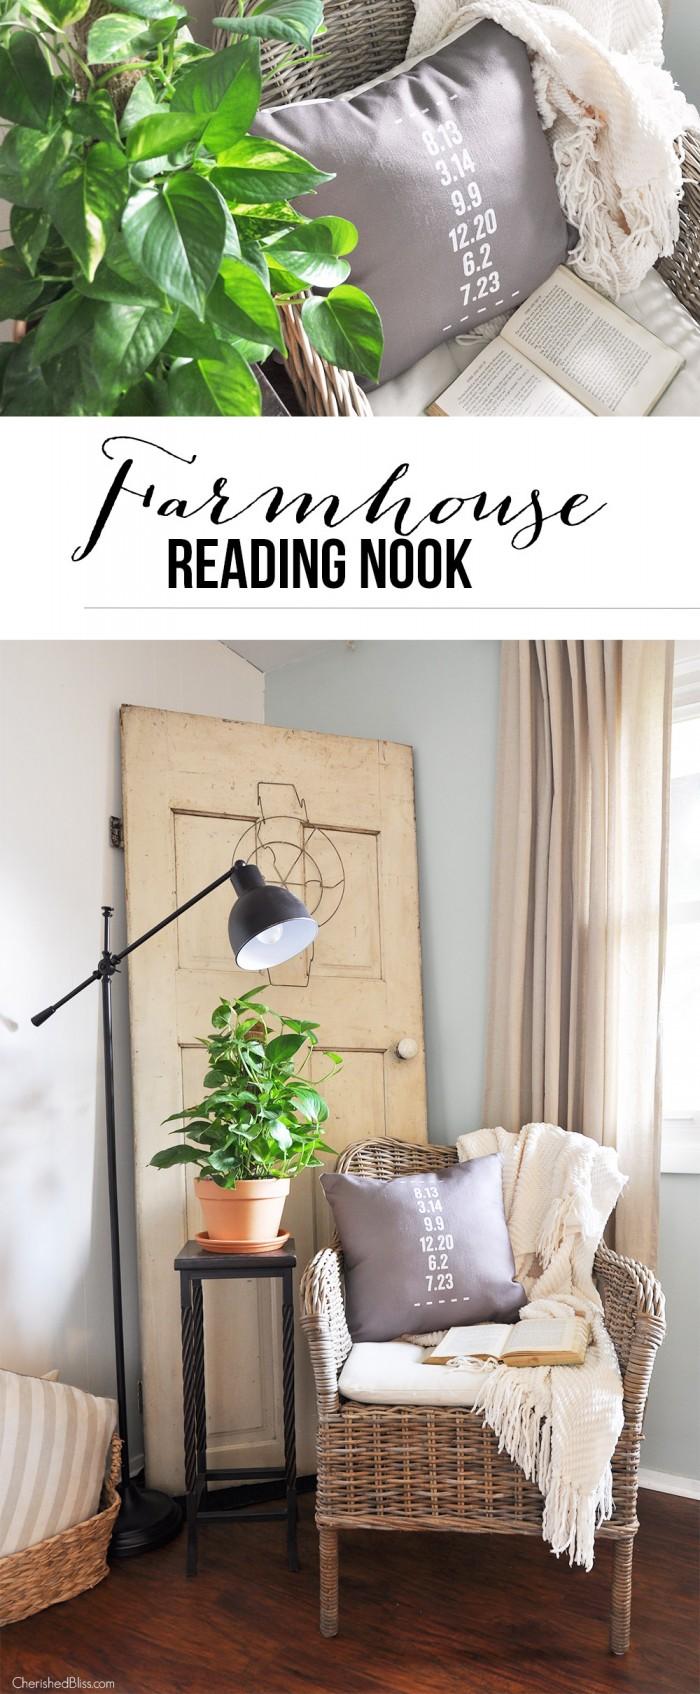 Farmhouse-Reading-Nook-700x1694